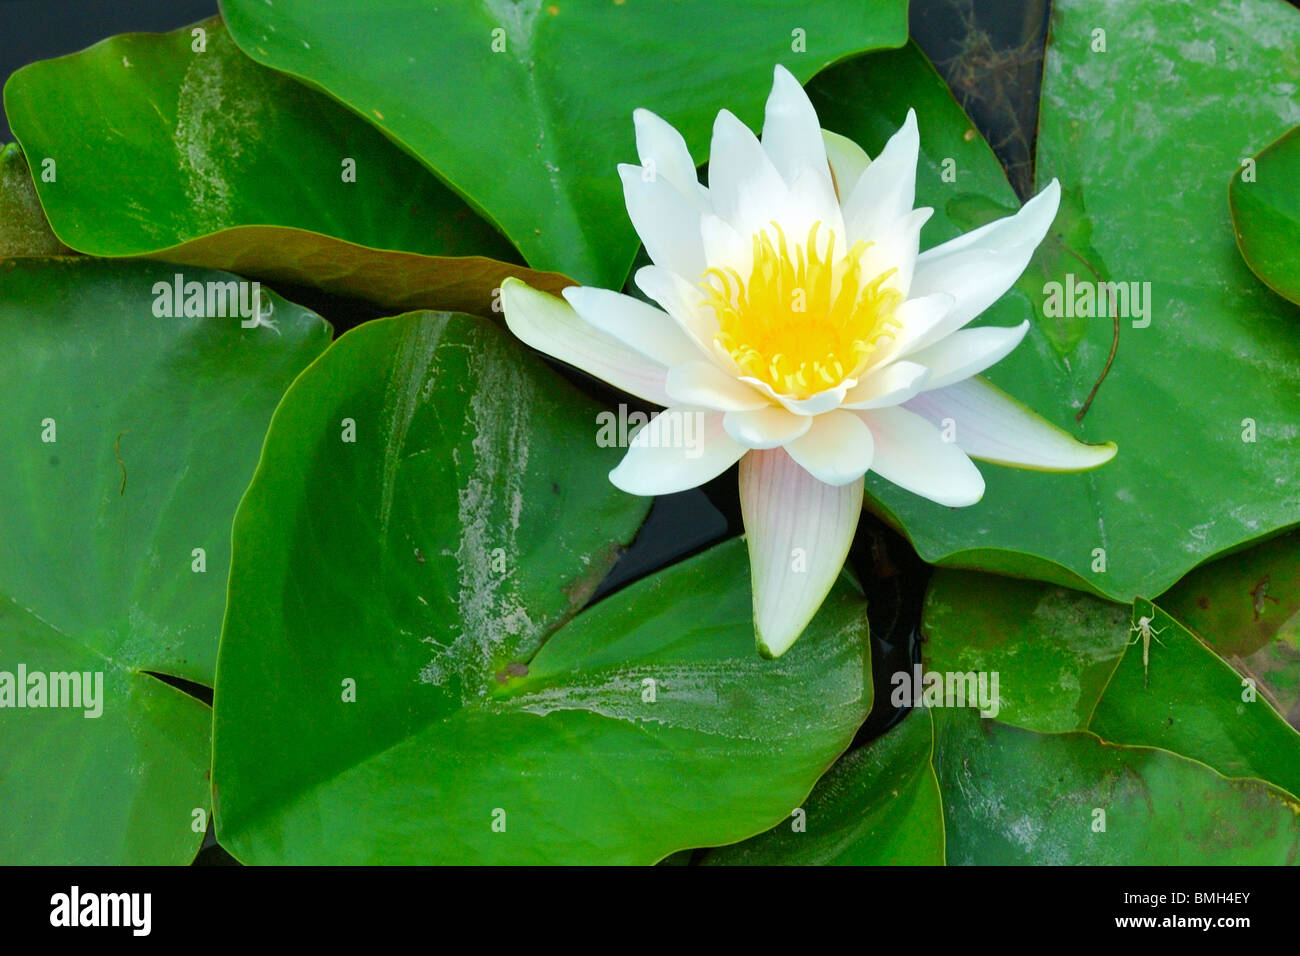 Nymphaea lotus the tiger lotus white lotus or egyptian white stock nymphaea lotus the tiger lotus white lotus or egyptian white water lily is a flowering plant of the family nymphaeaceae izmirmasajfo